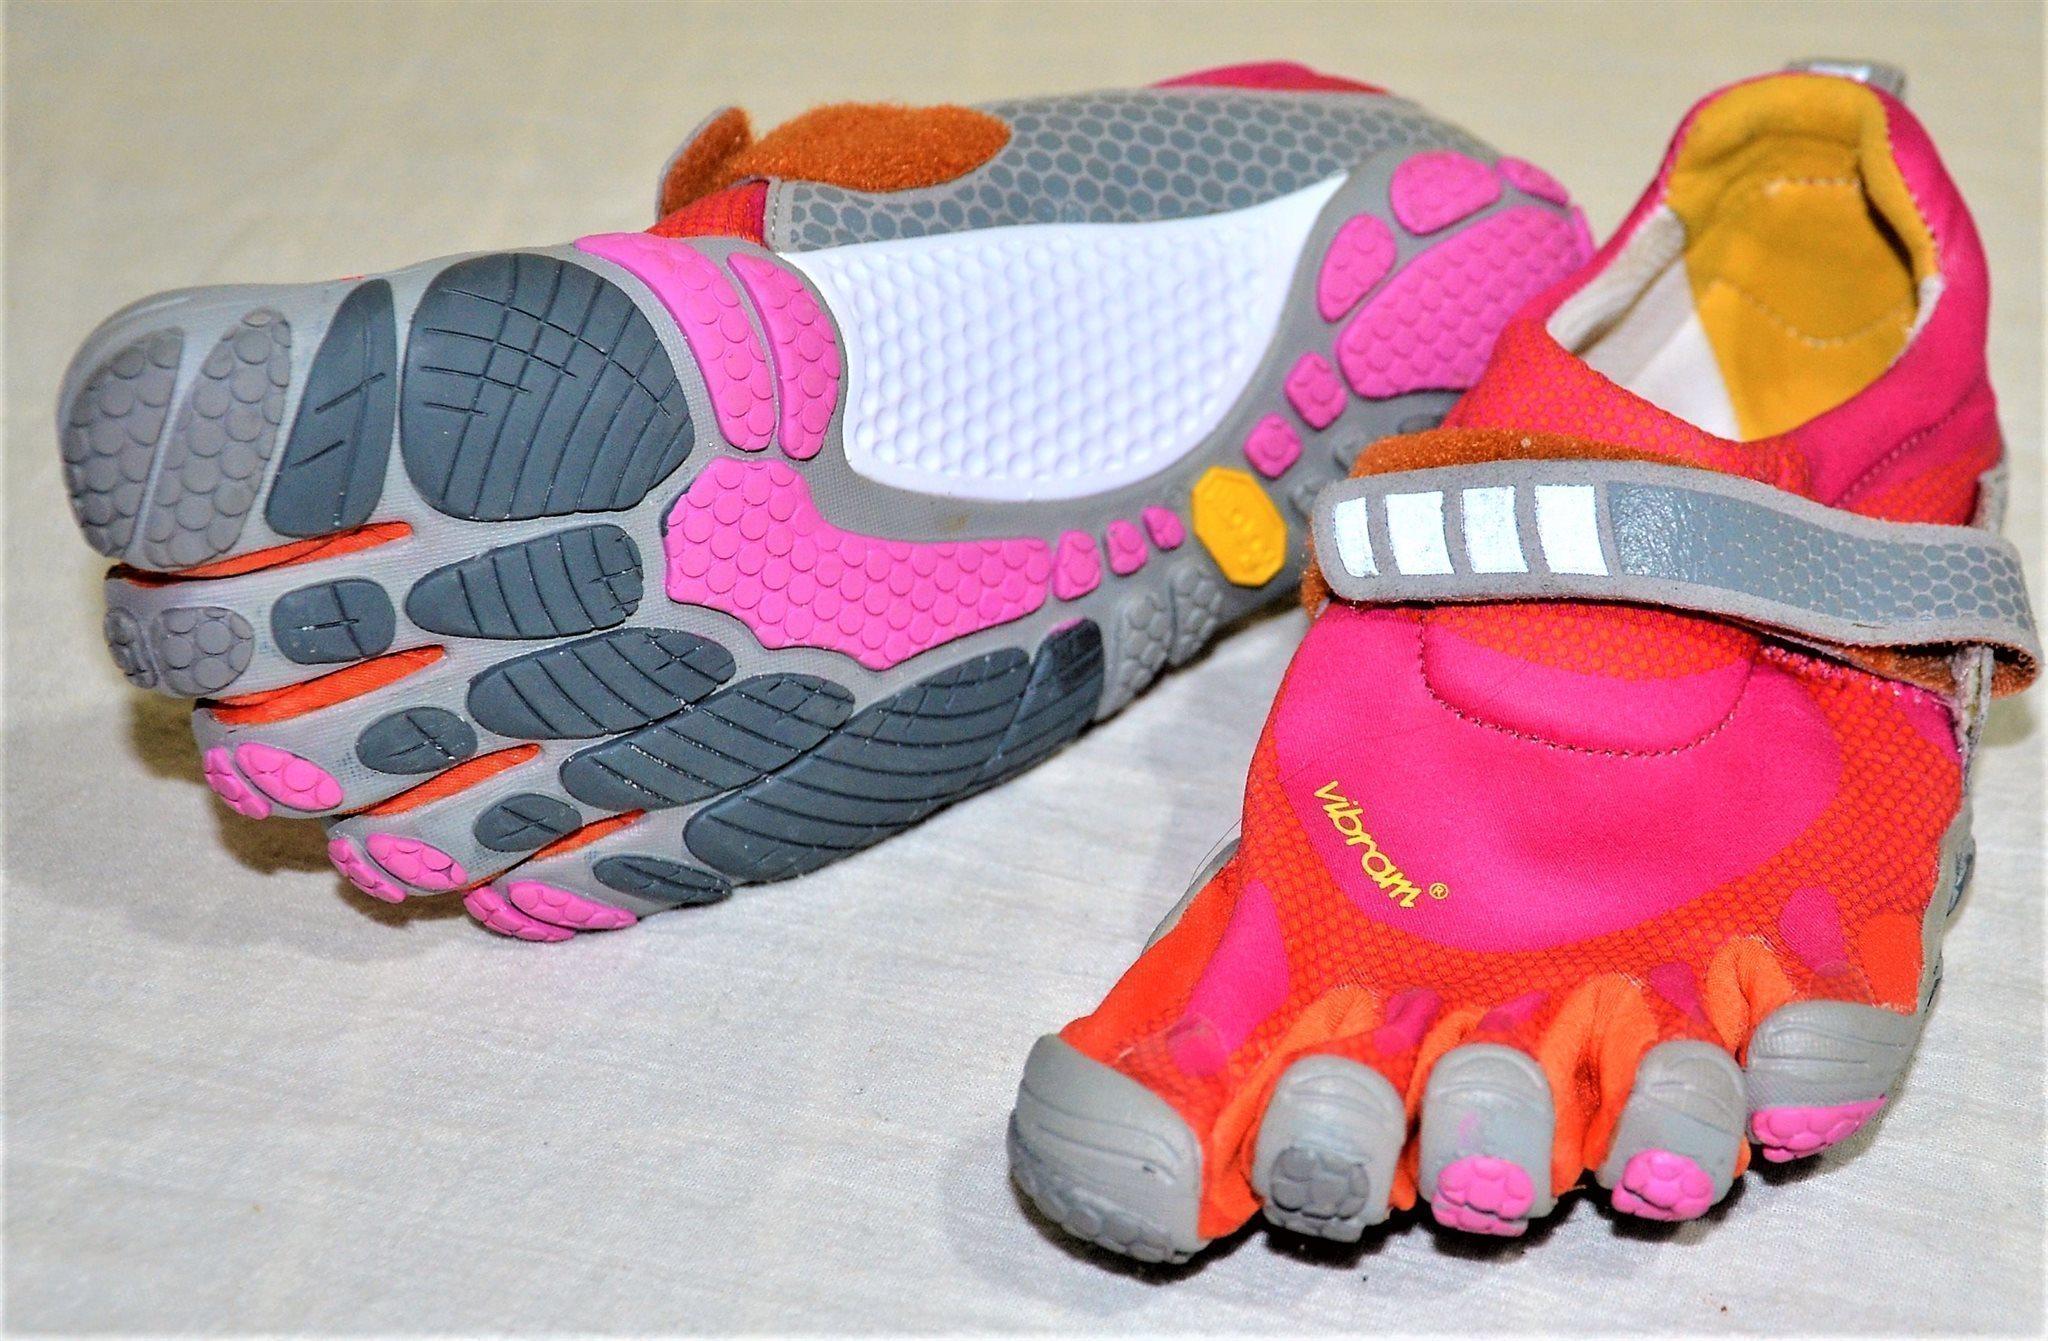 check out 21d21 bb2db Vibram FiveFingers Bikila W343 Minimalist Barefoot Shoes Size 36 Pink Orange